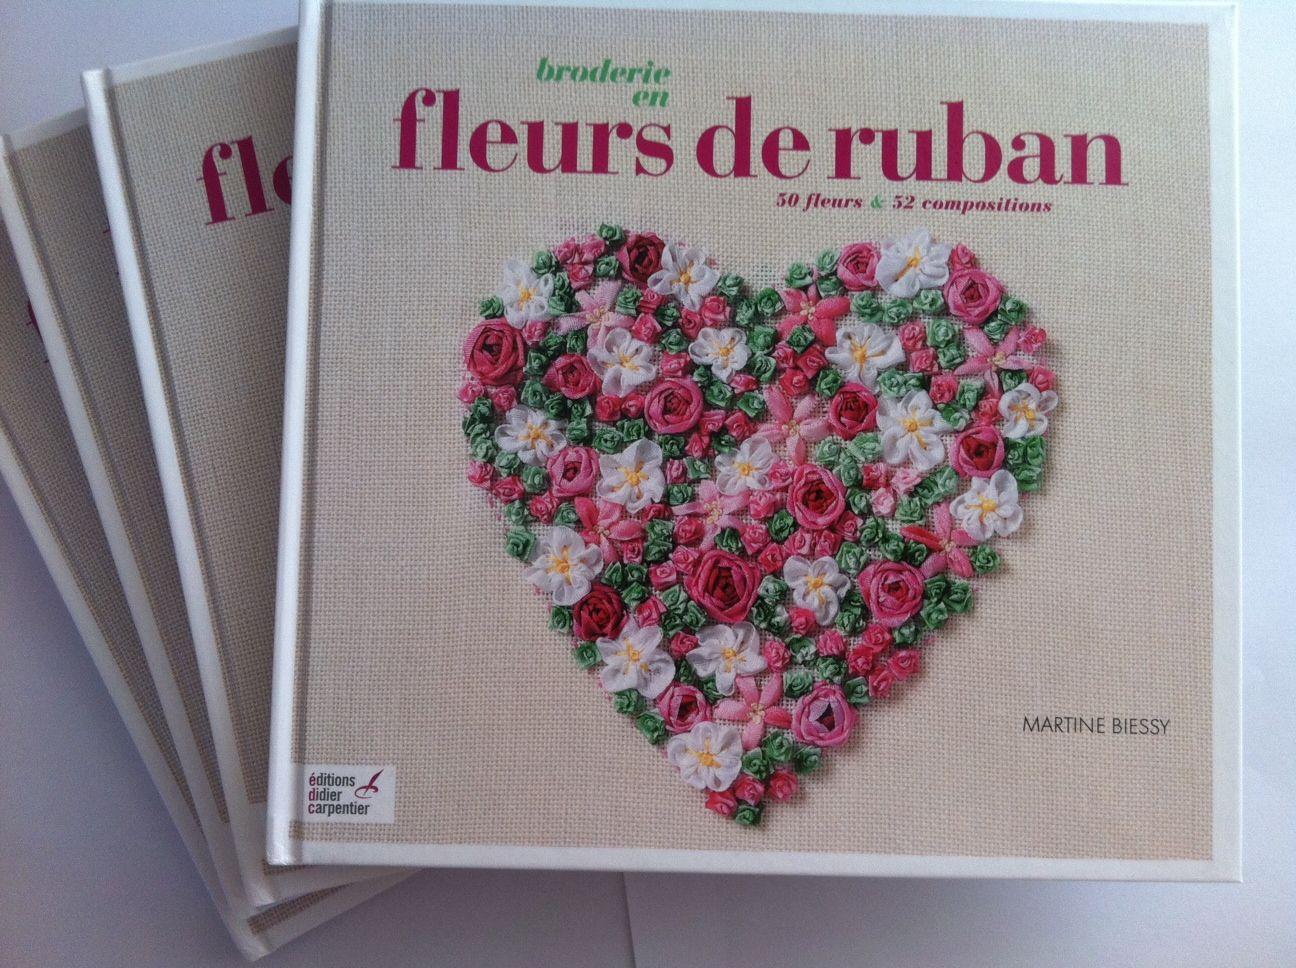 Fleurs de ruban - Editions Didier Carpentier